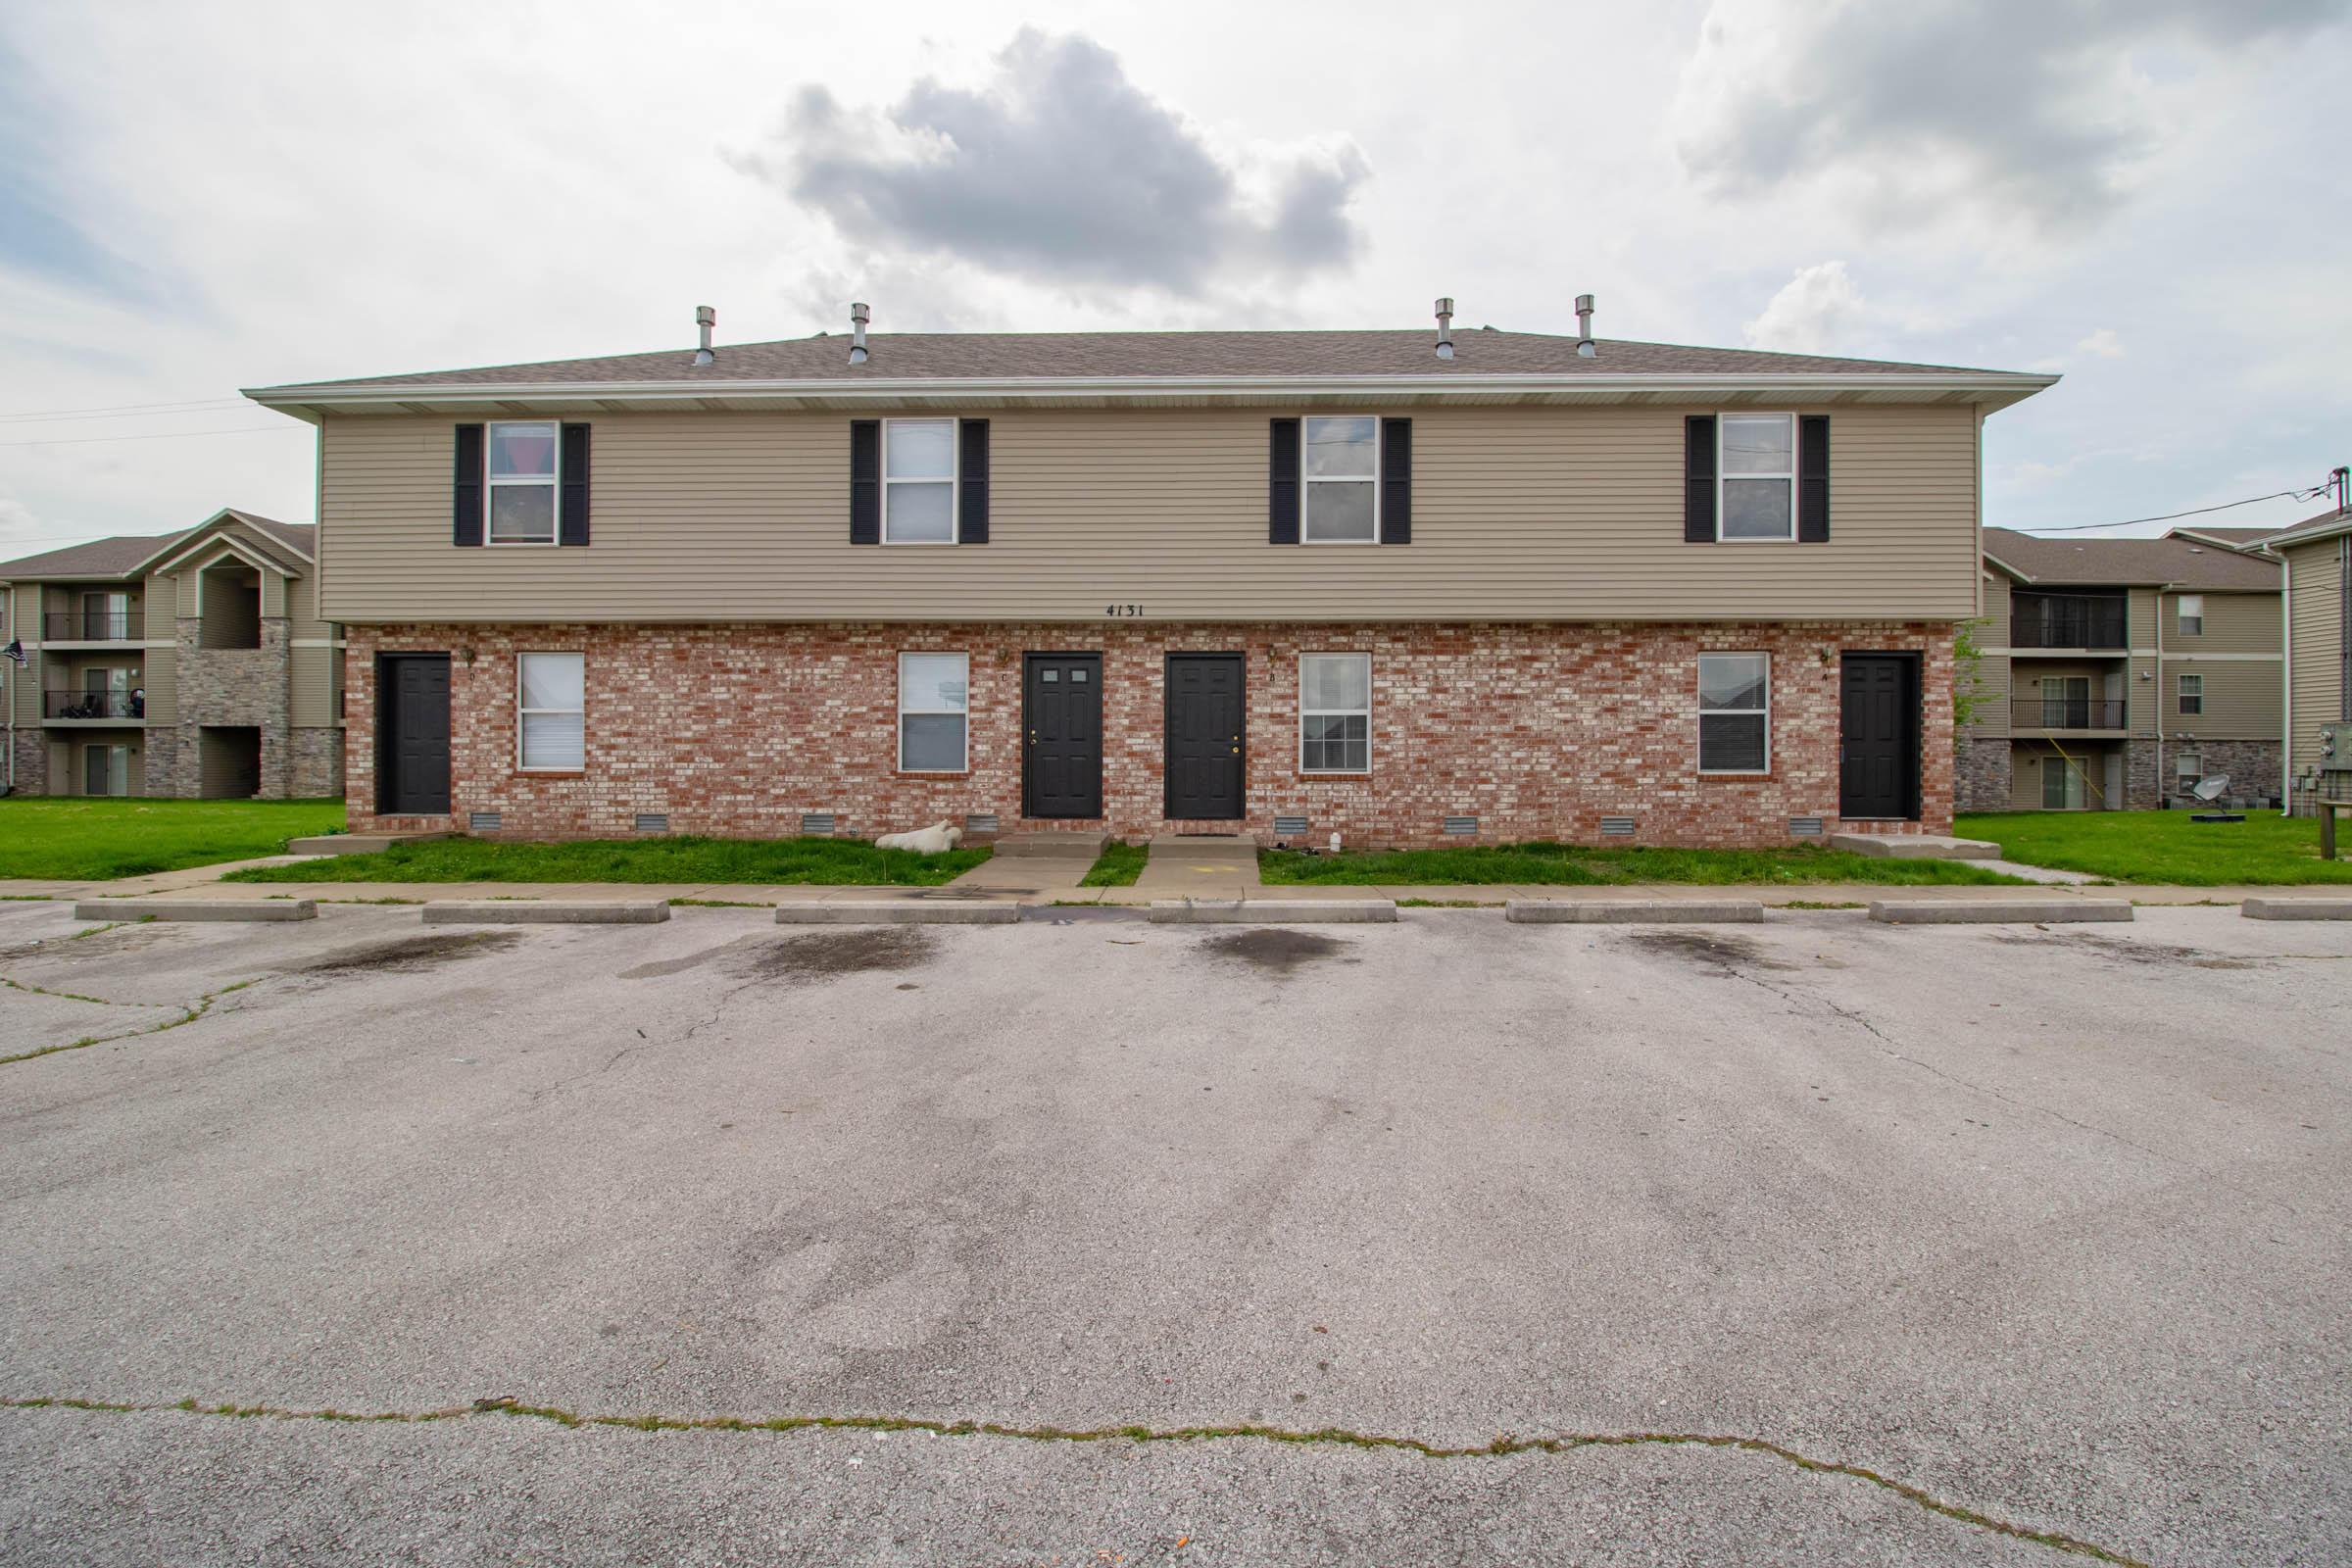 4115/4131 South Glenn Avenue Springfield, MO 65807